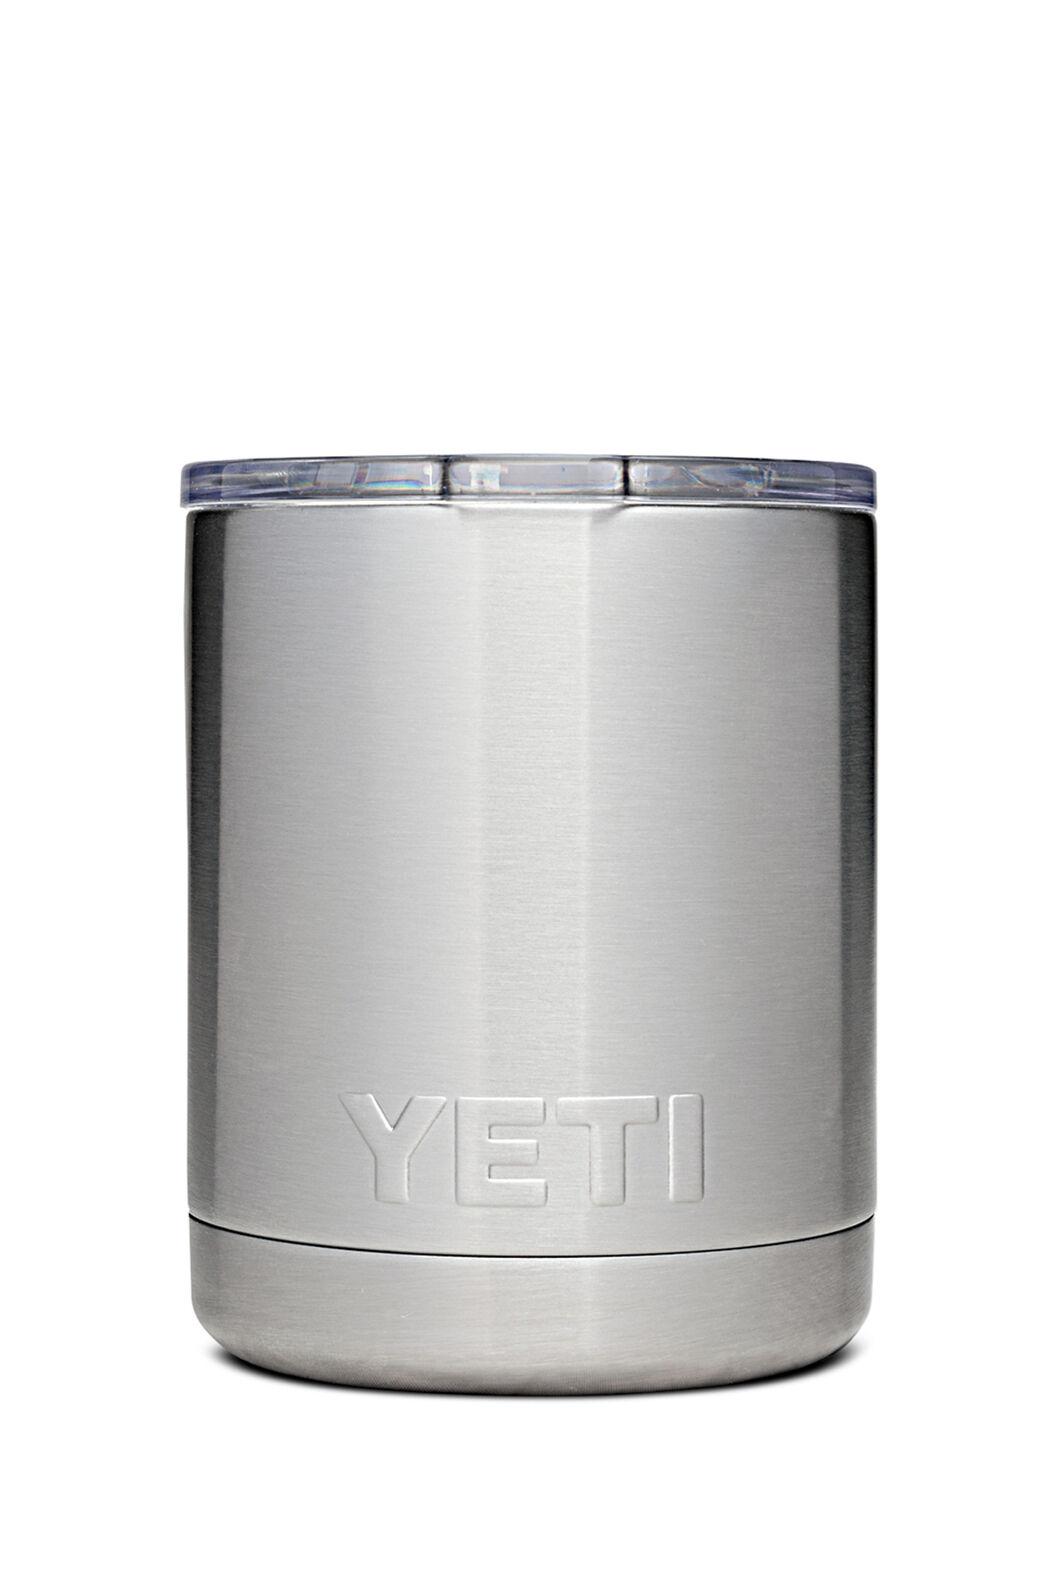 YETI® Rambler Lowball Tumbler — 10oz, Silver, hi-res